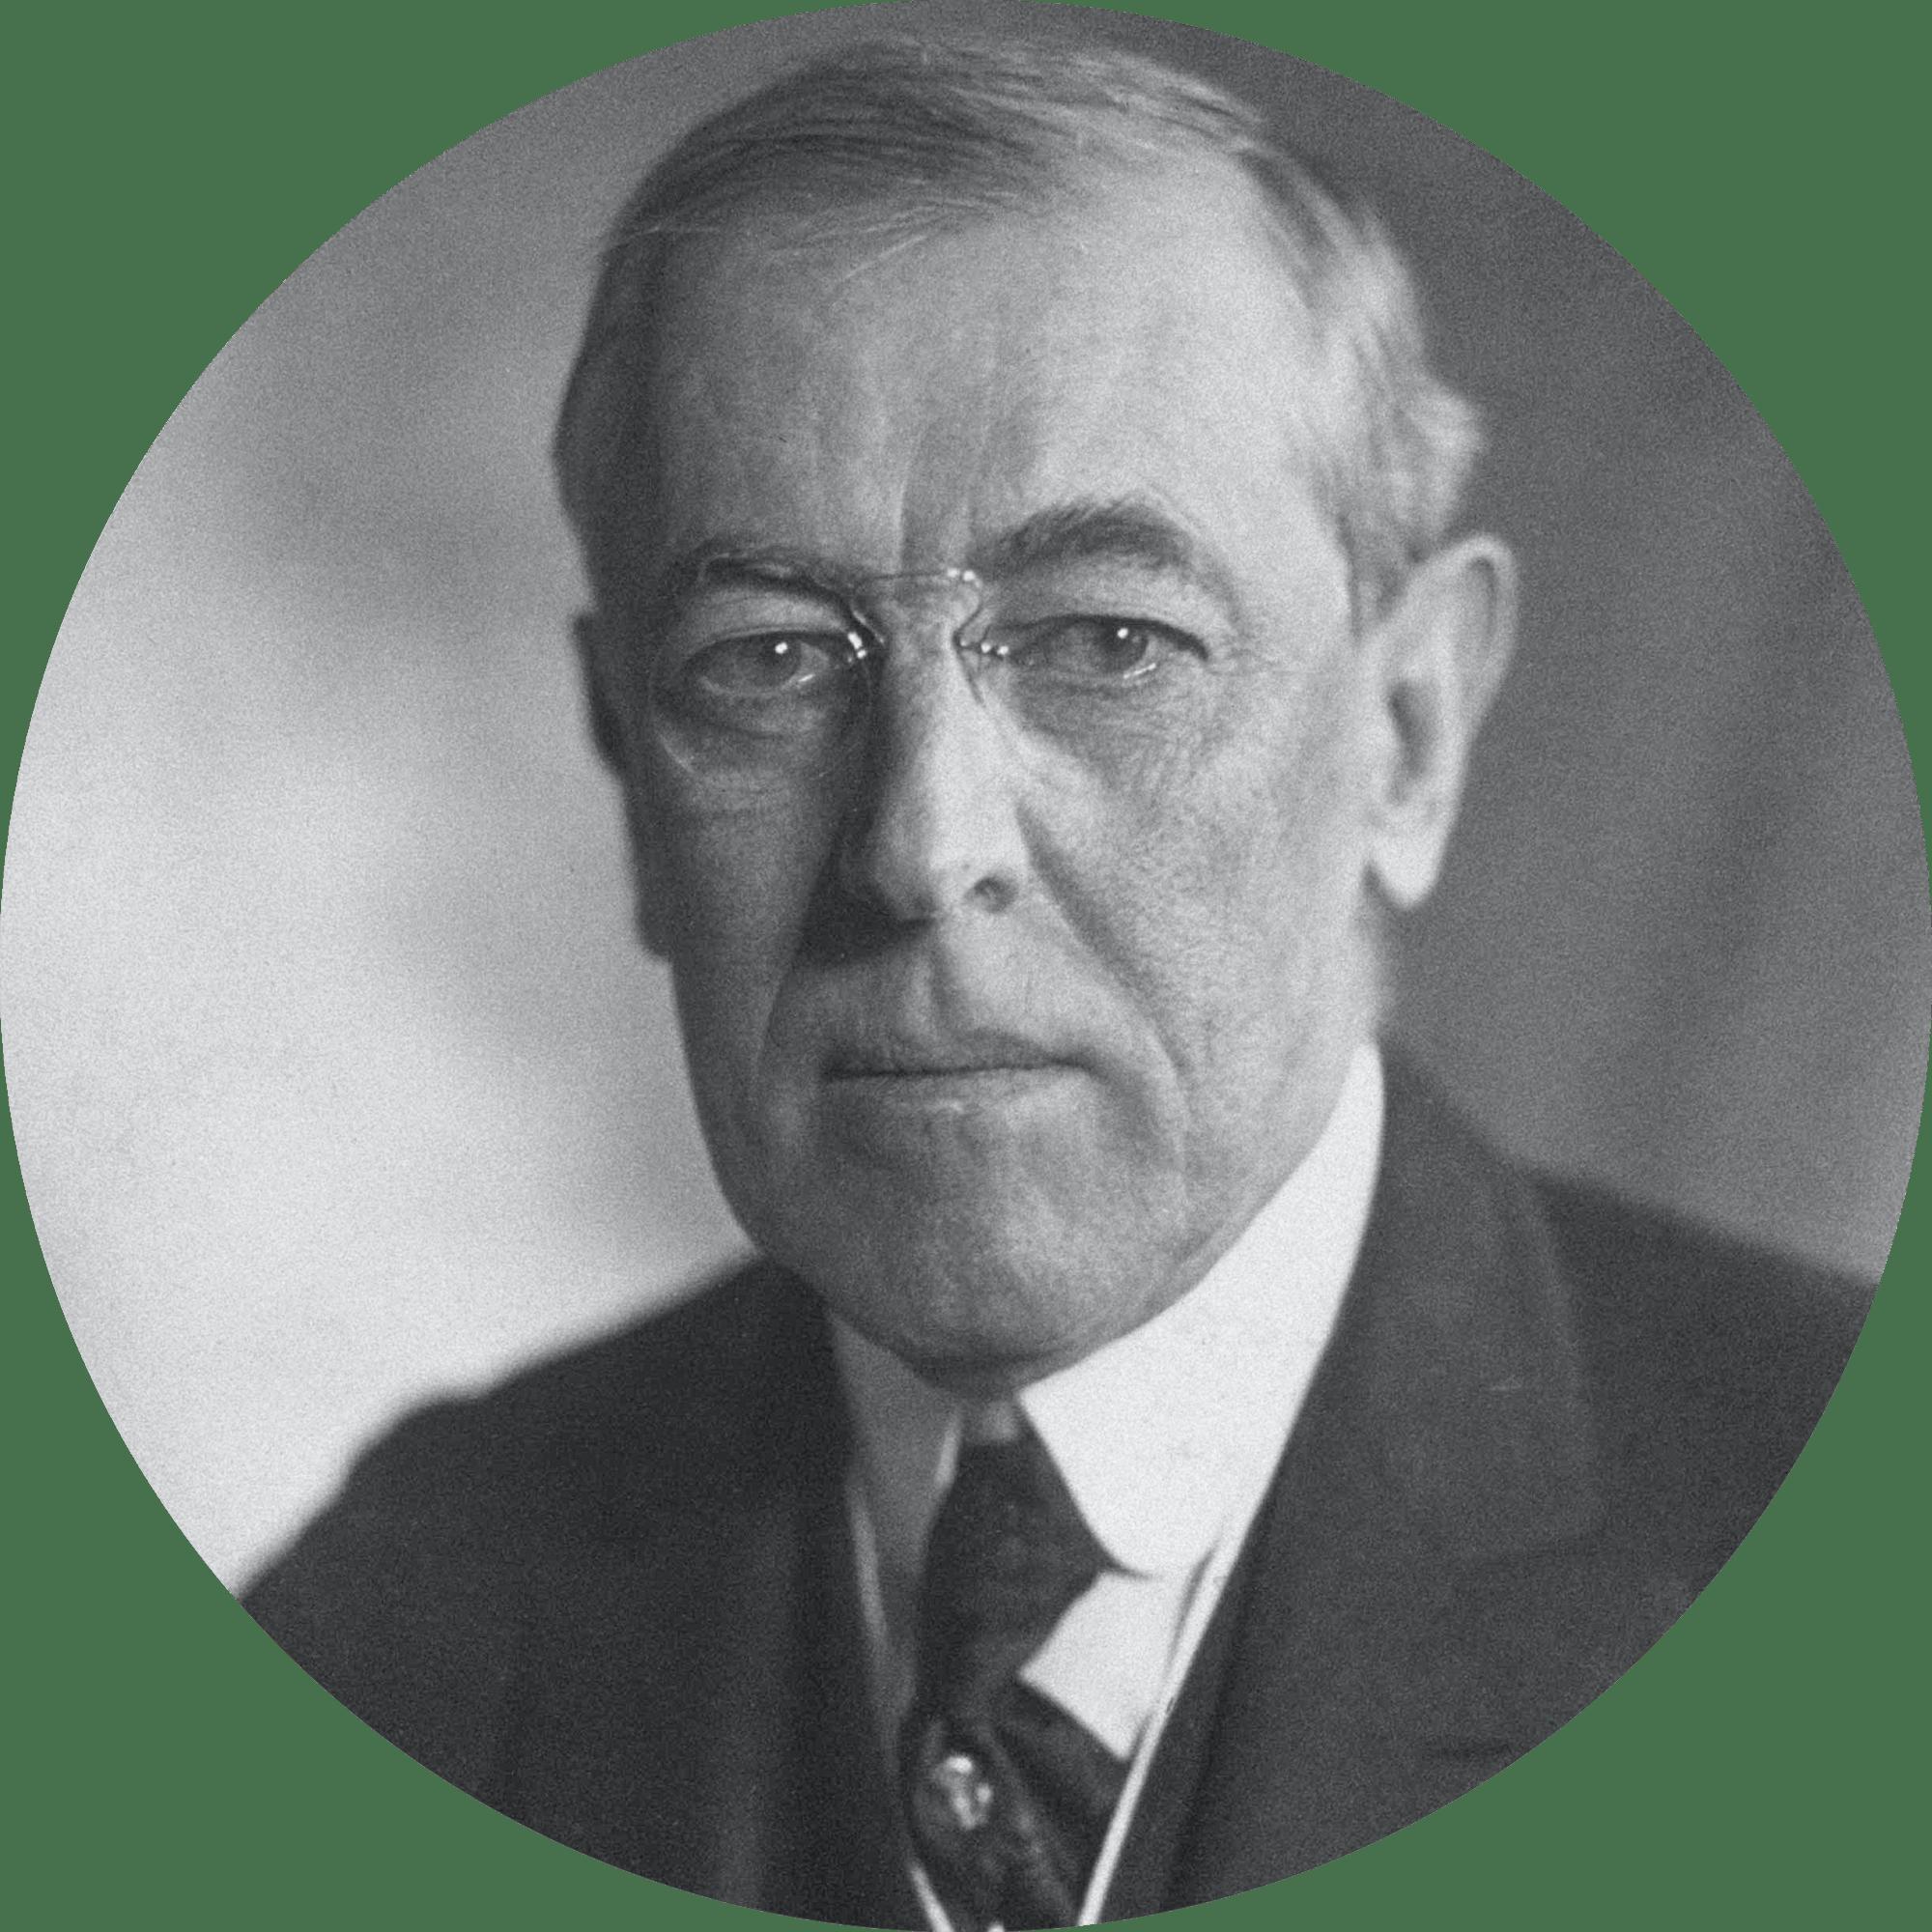 président Wilson